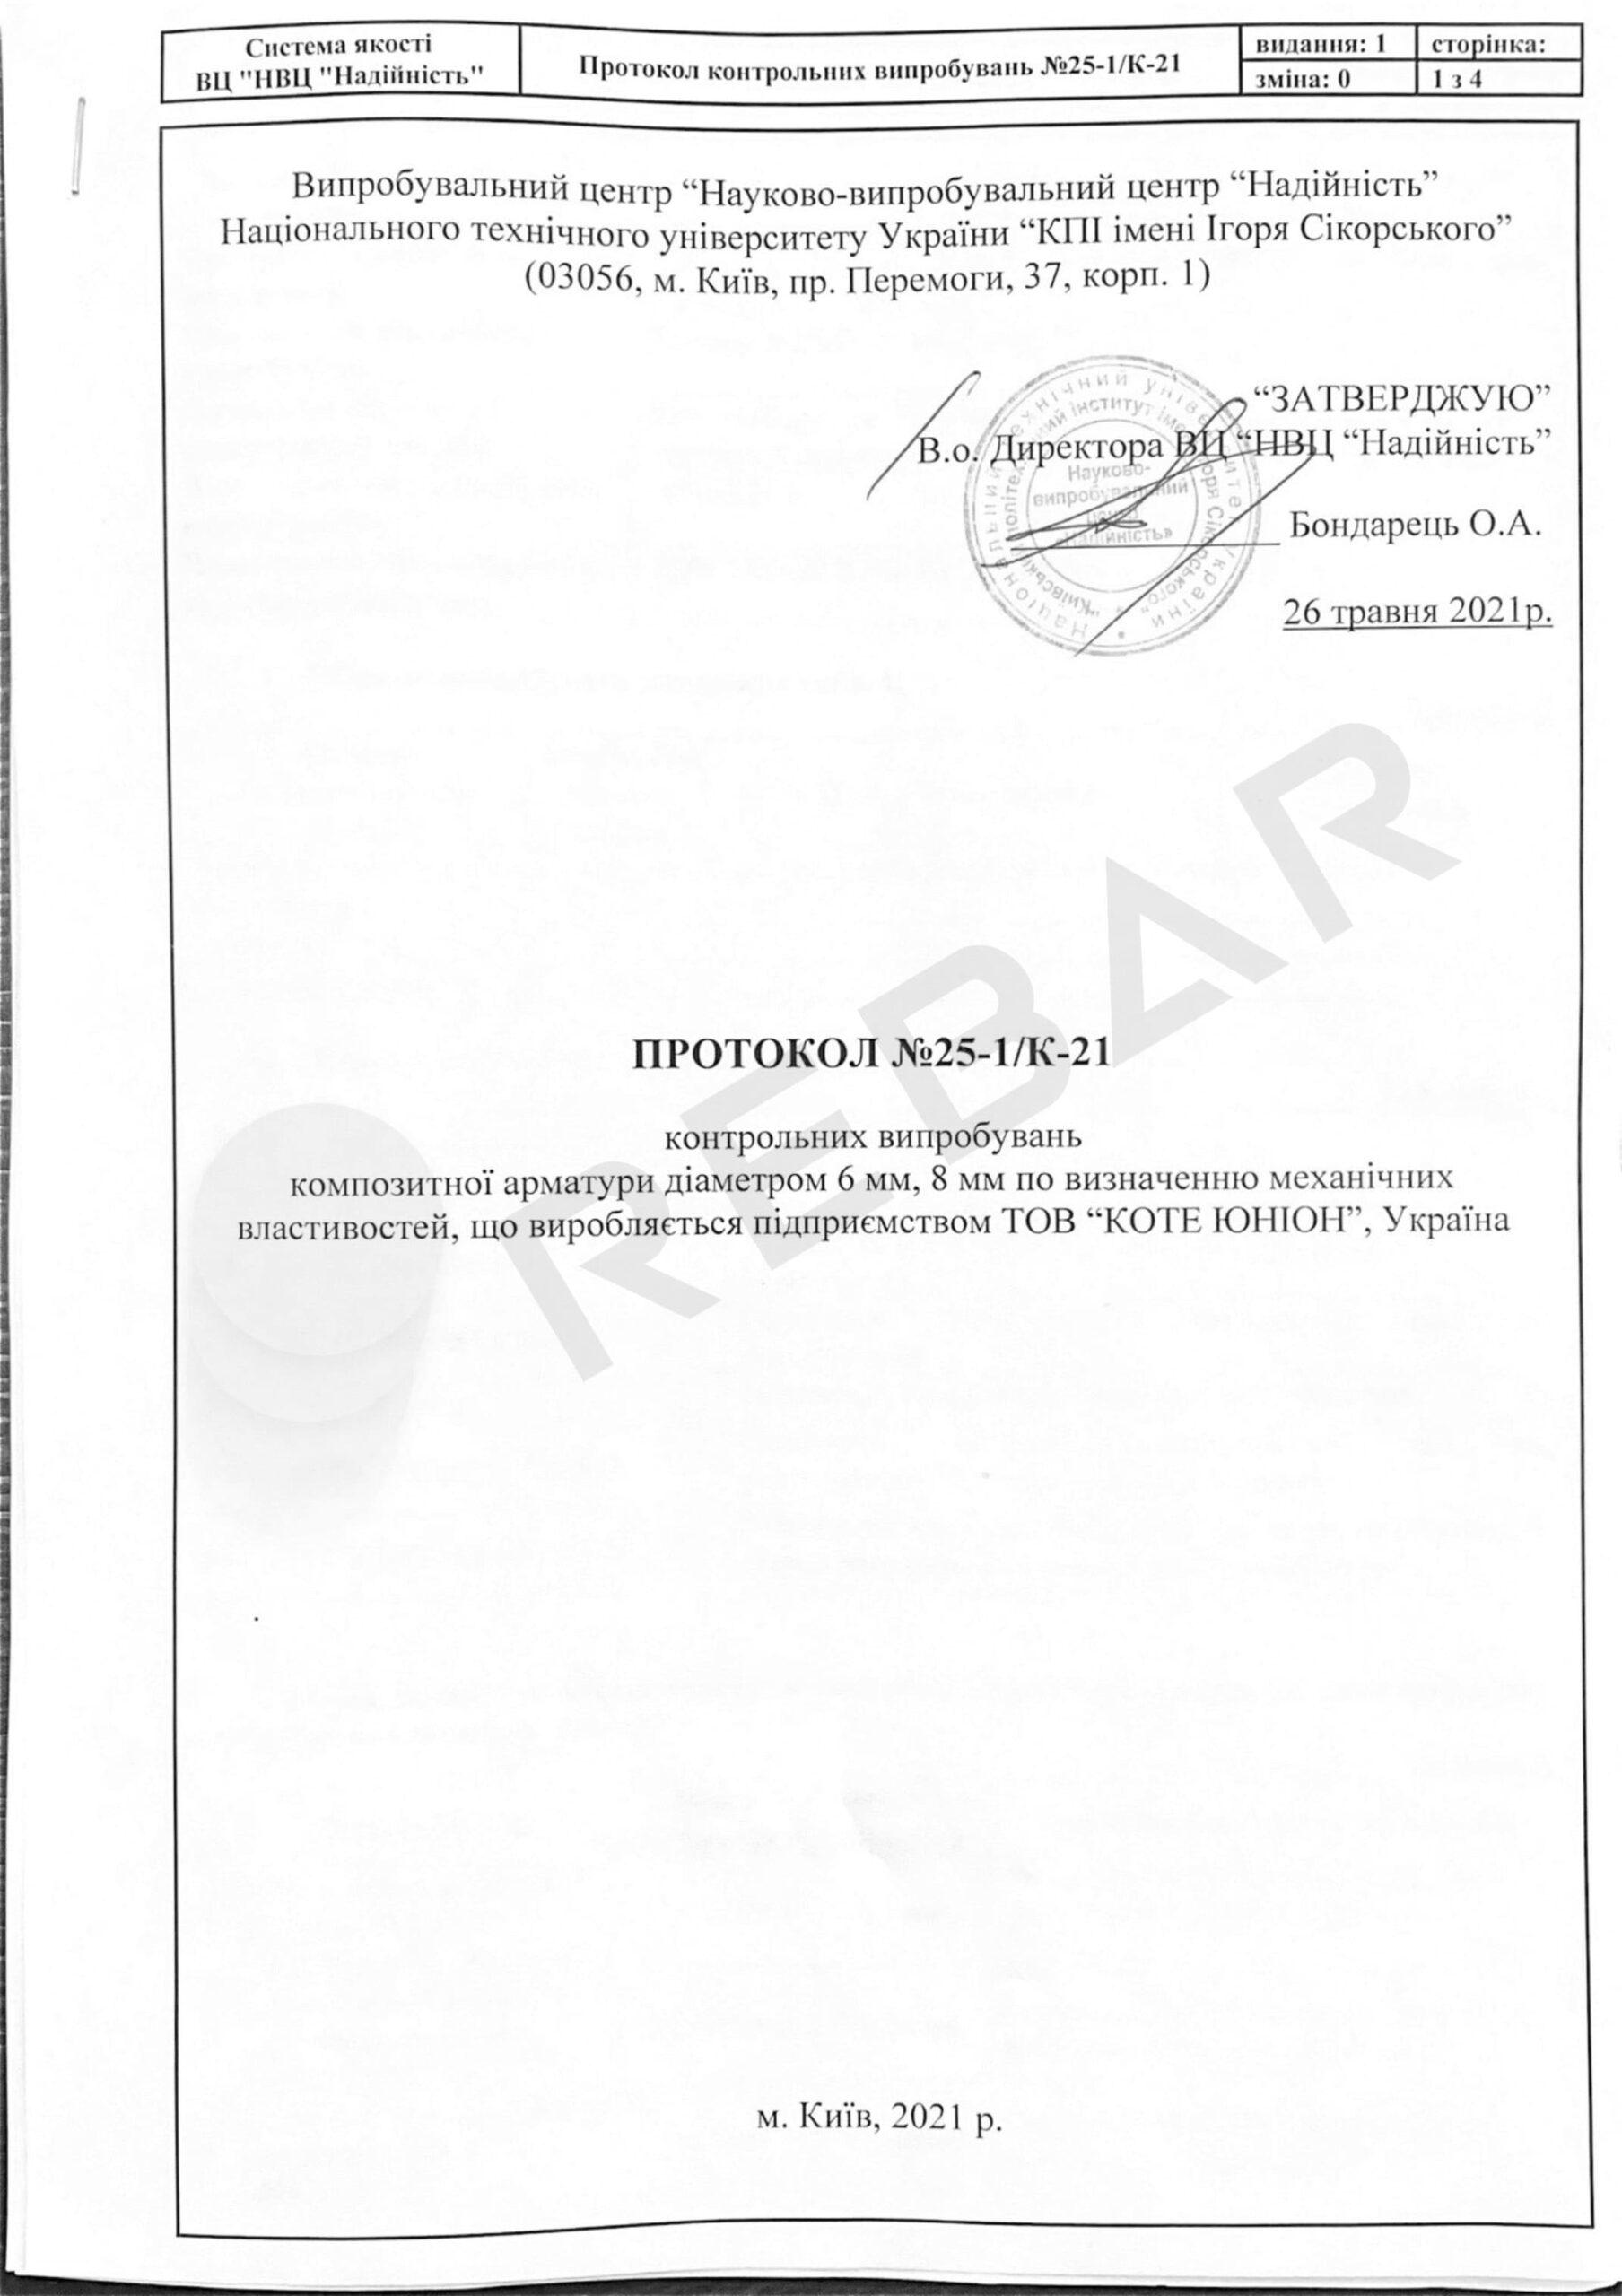 M. KHÜB, 2021 p-2 копия